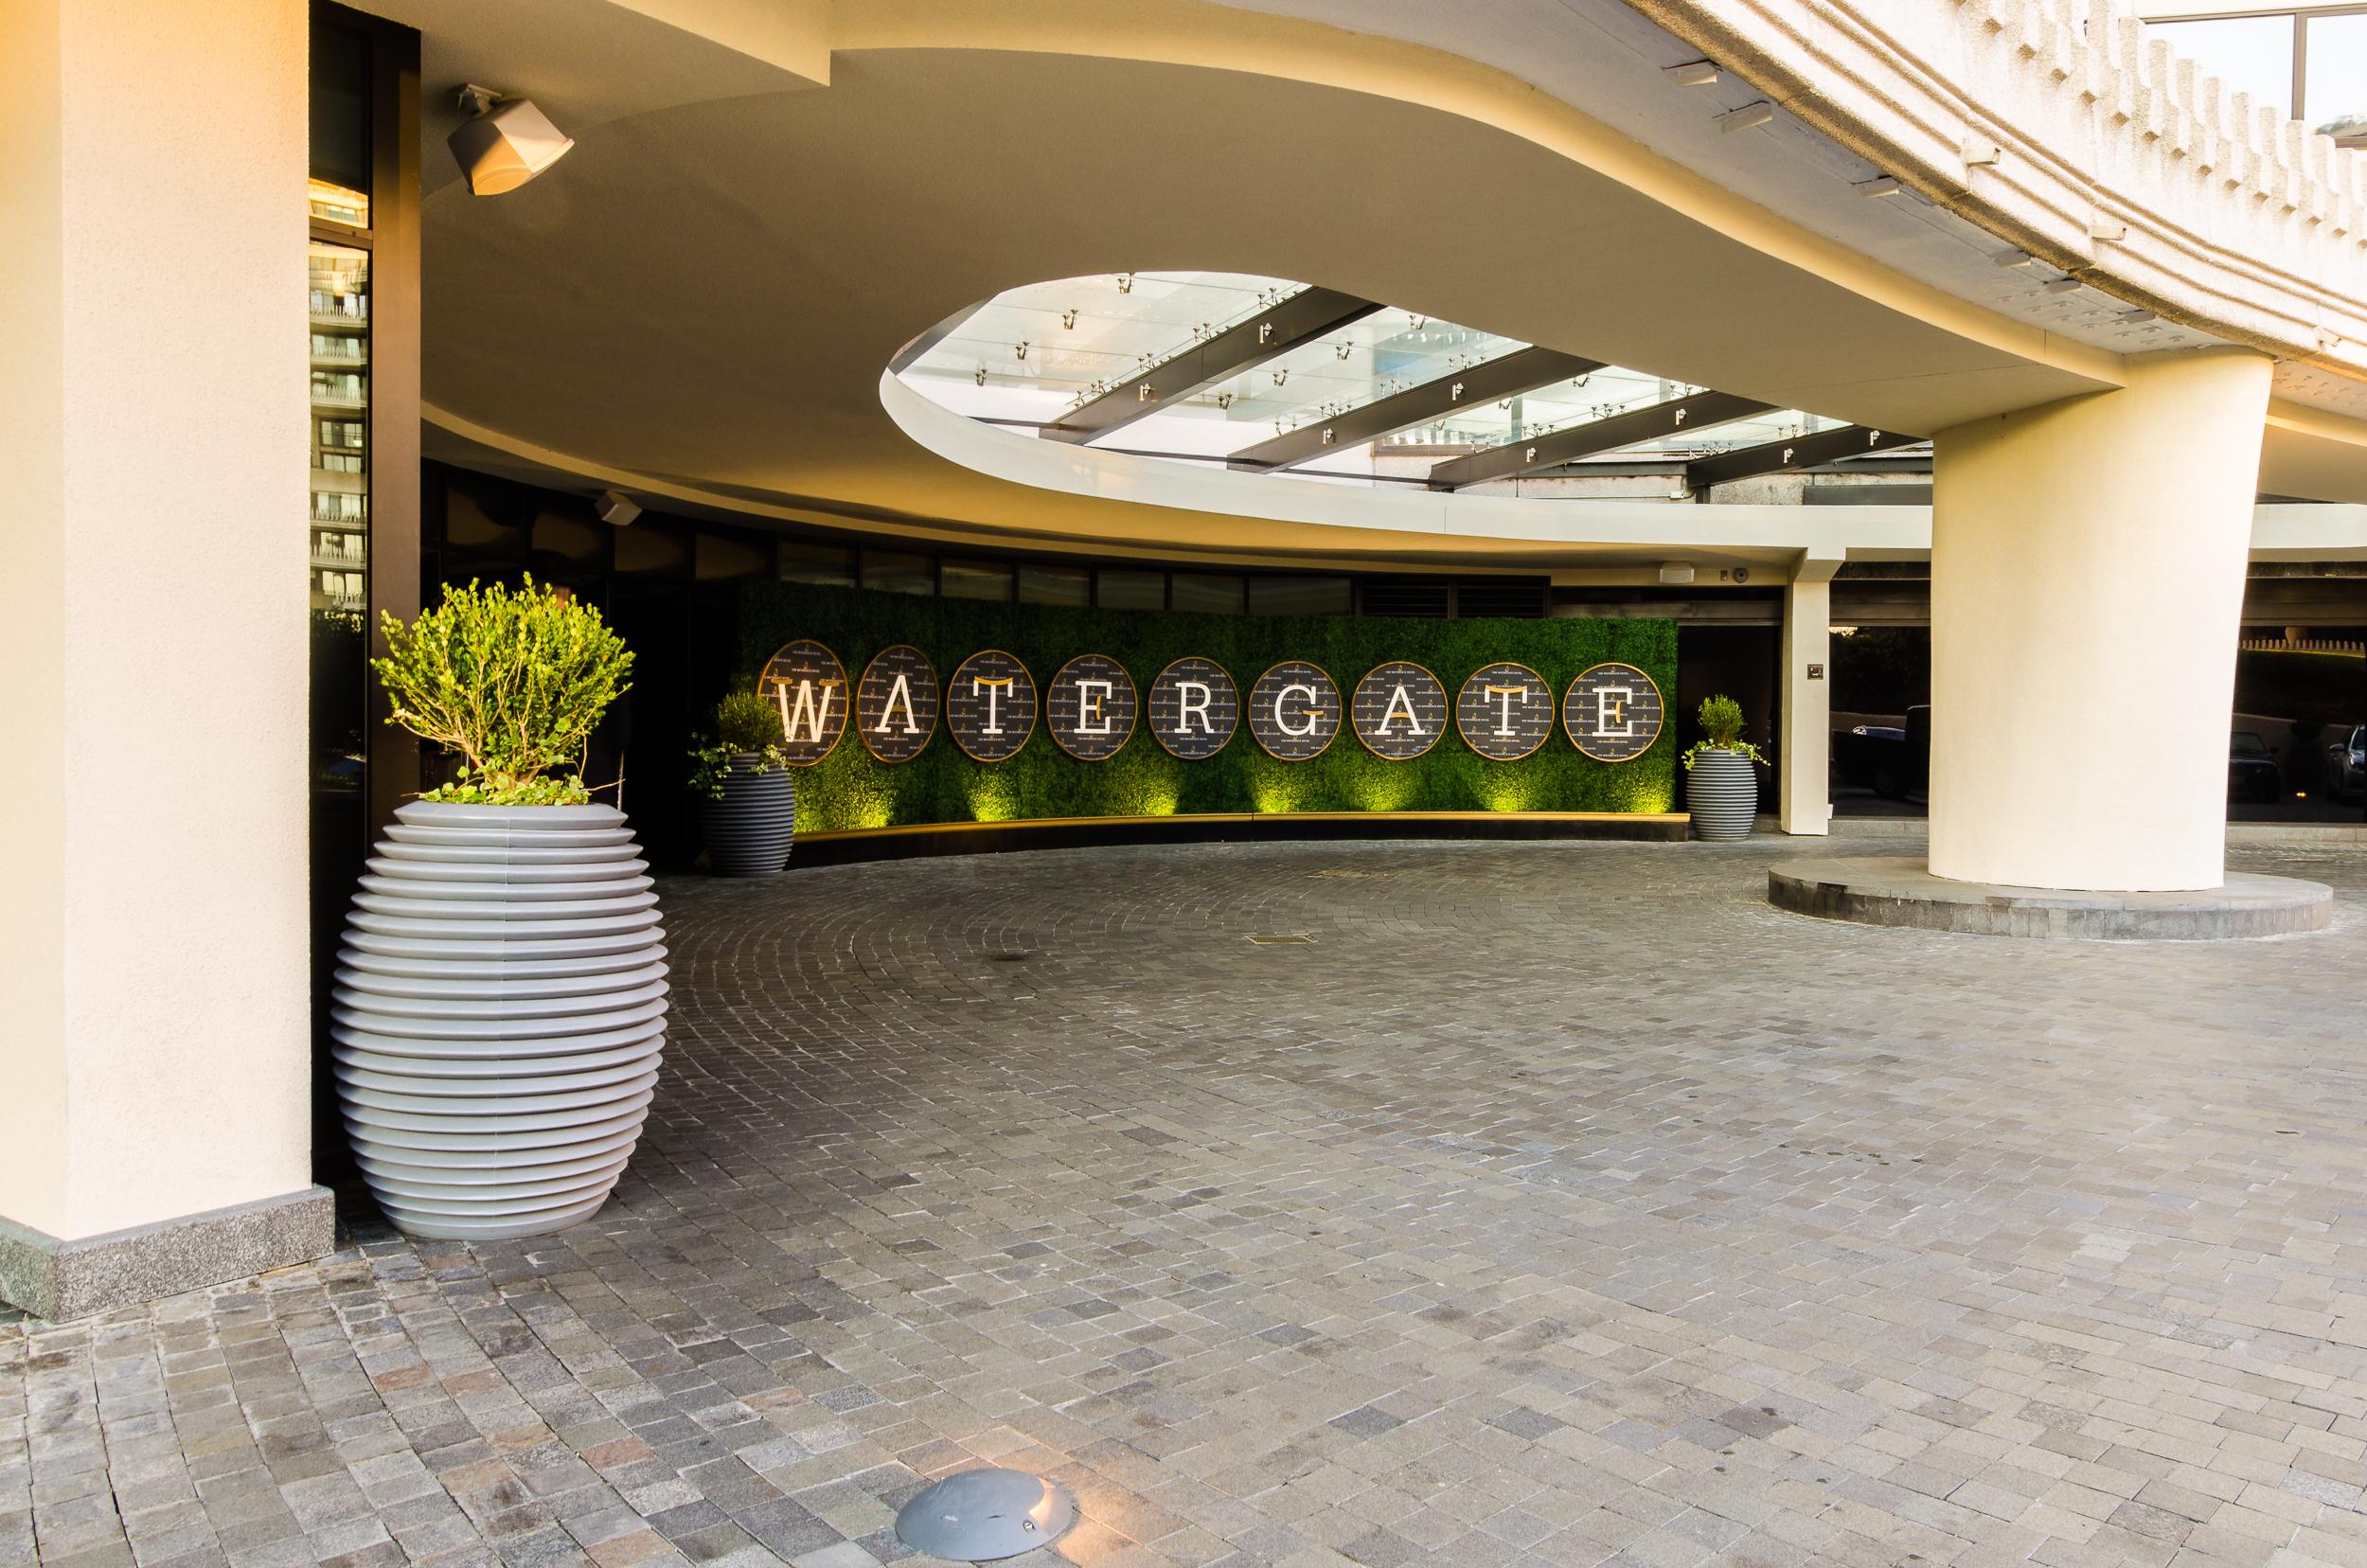 16_Watergate Hotel 01.jpg